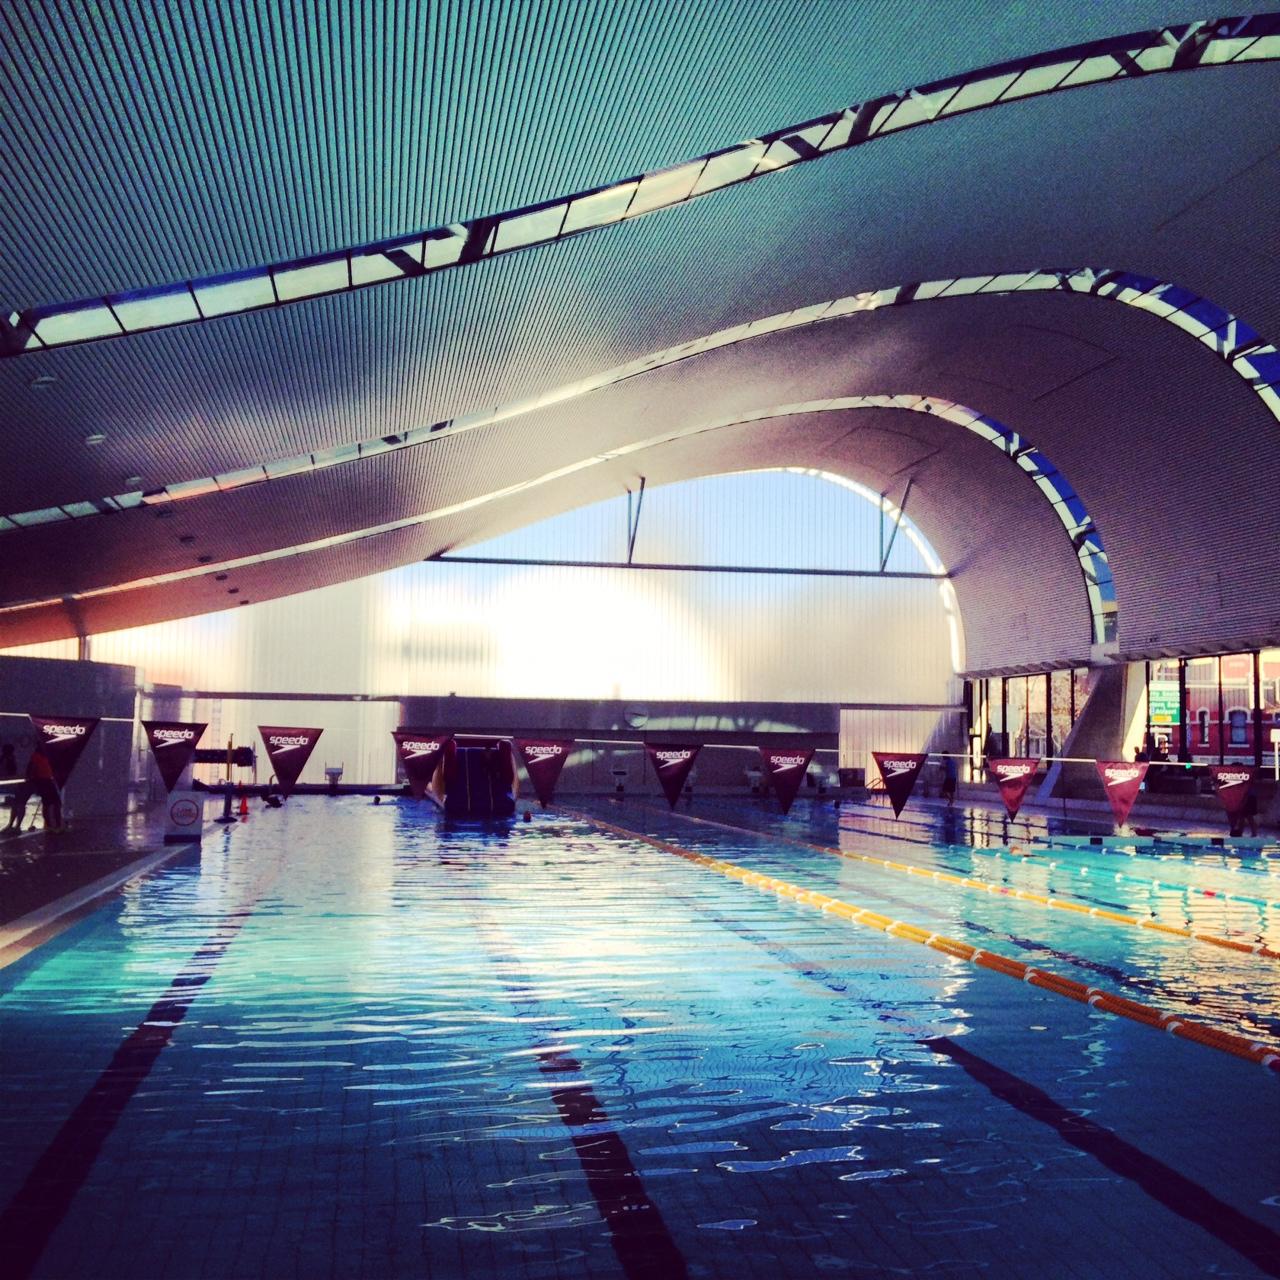 Sydney's best indoor swimming pool guide   I'd swim that